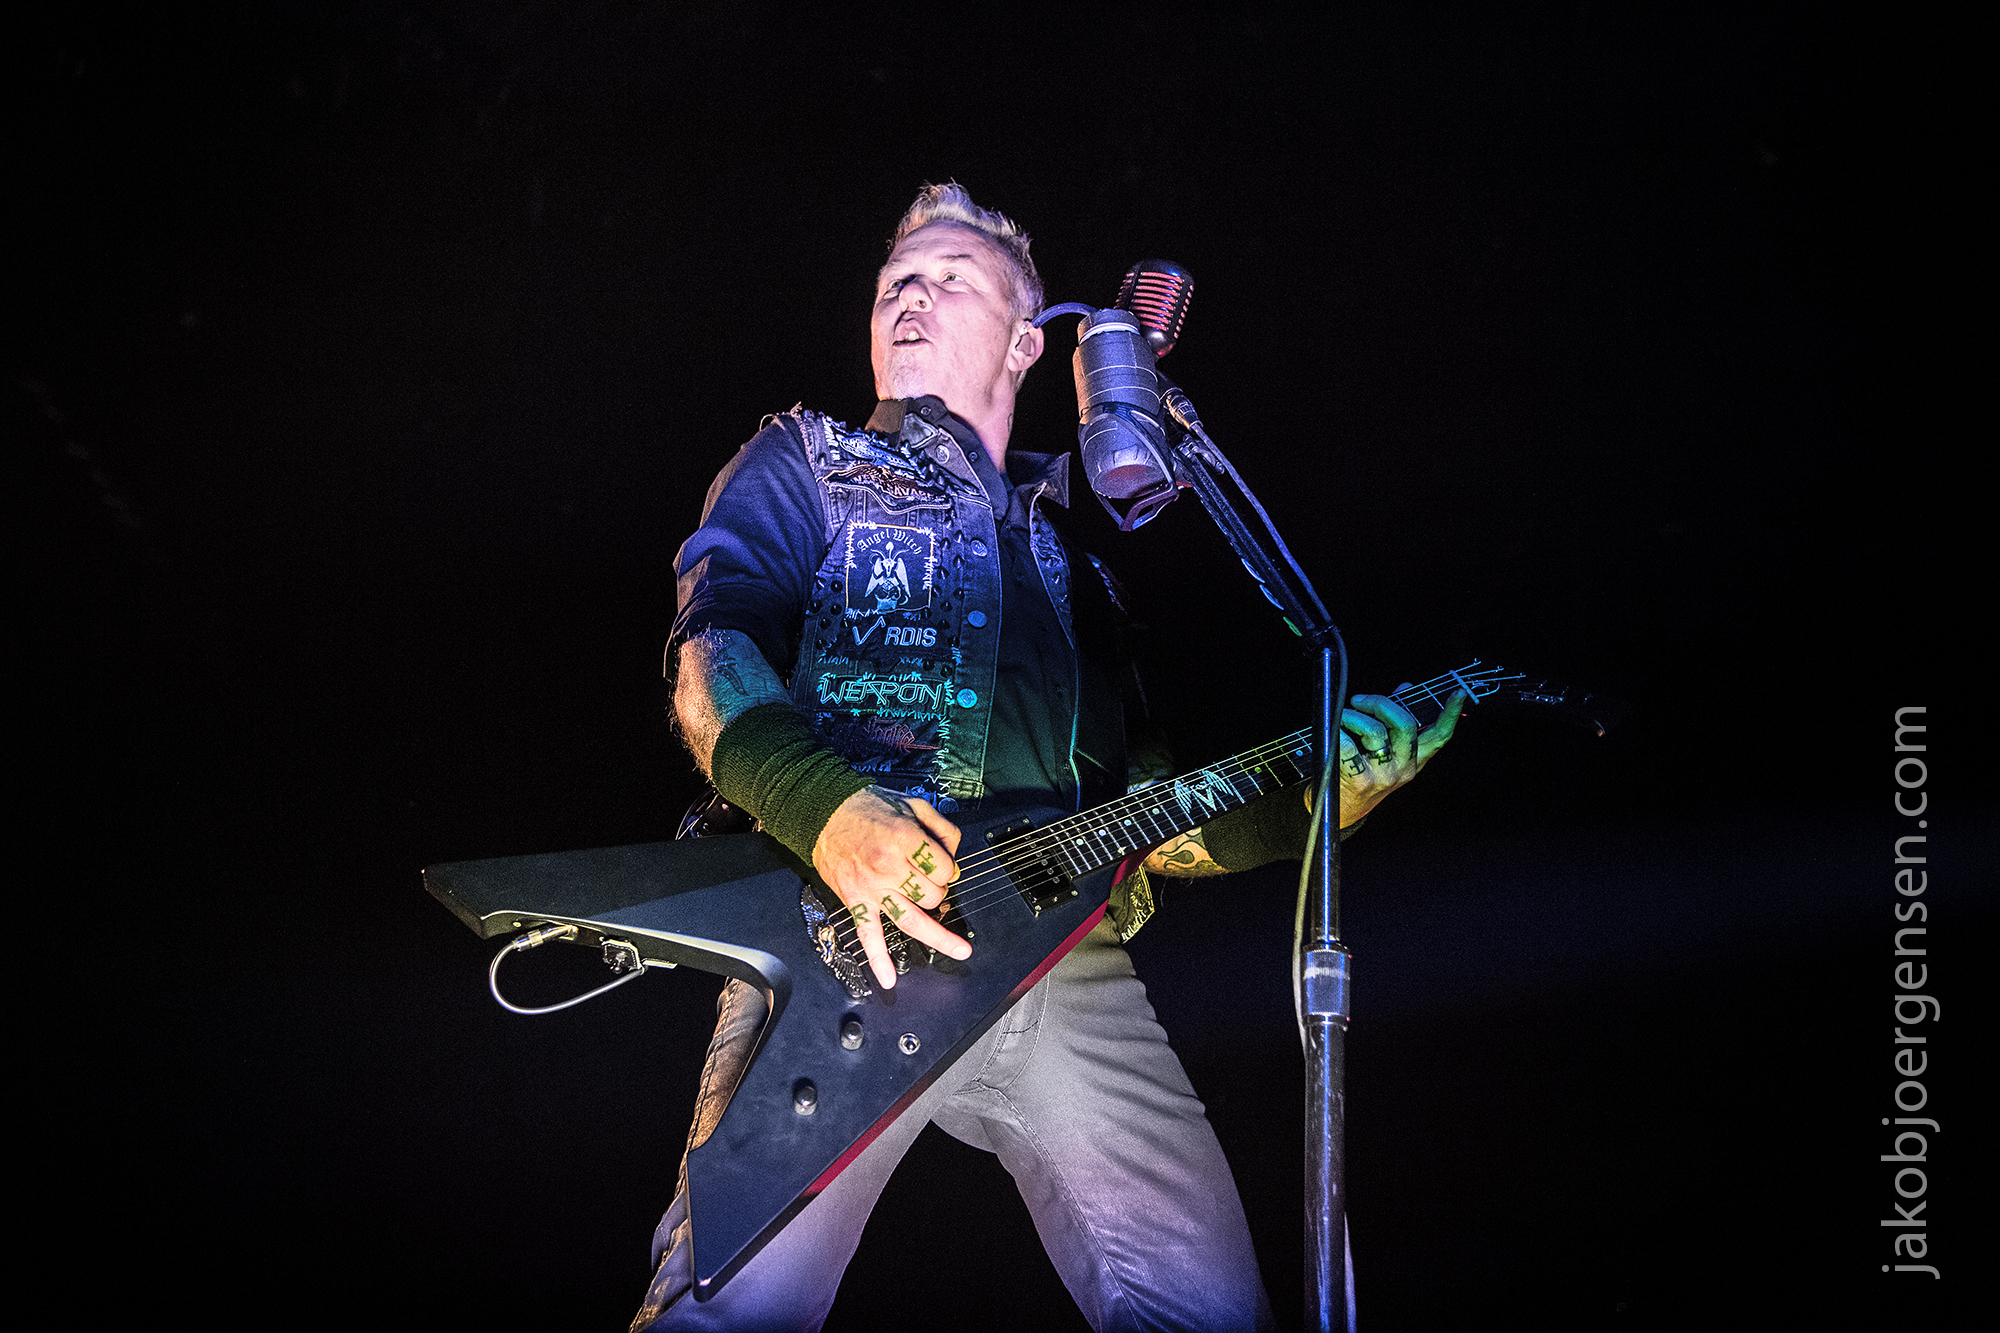 09-02-17_EB Metallica_0148.jpg